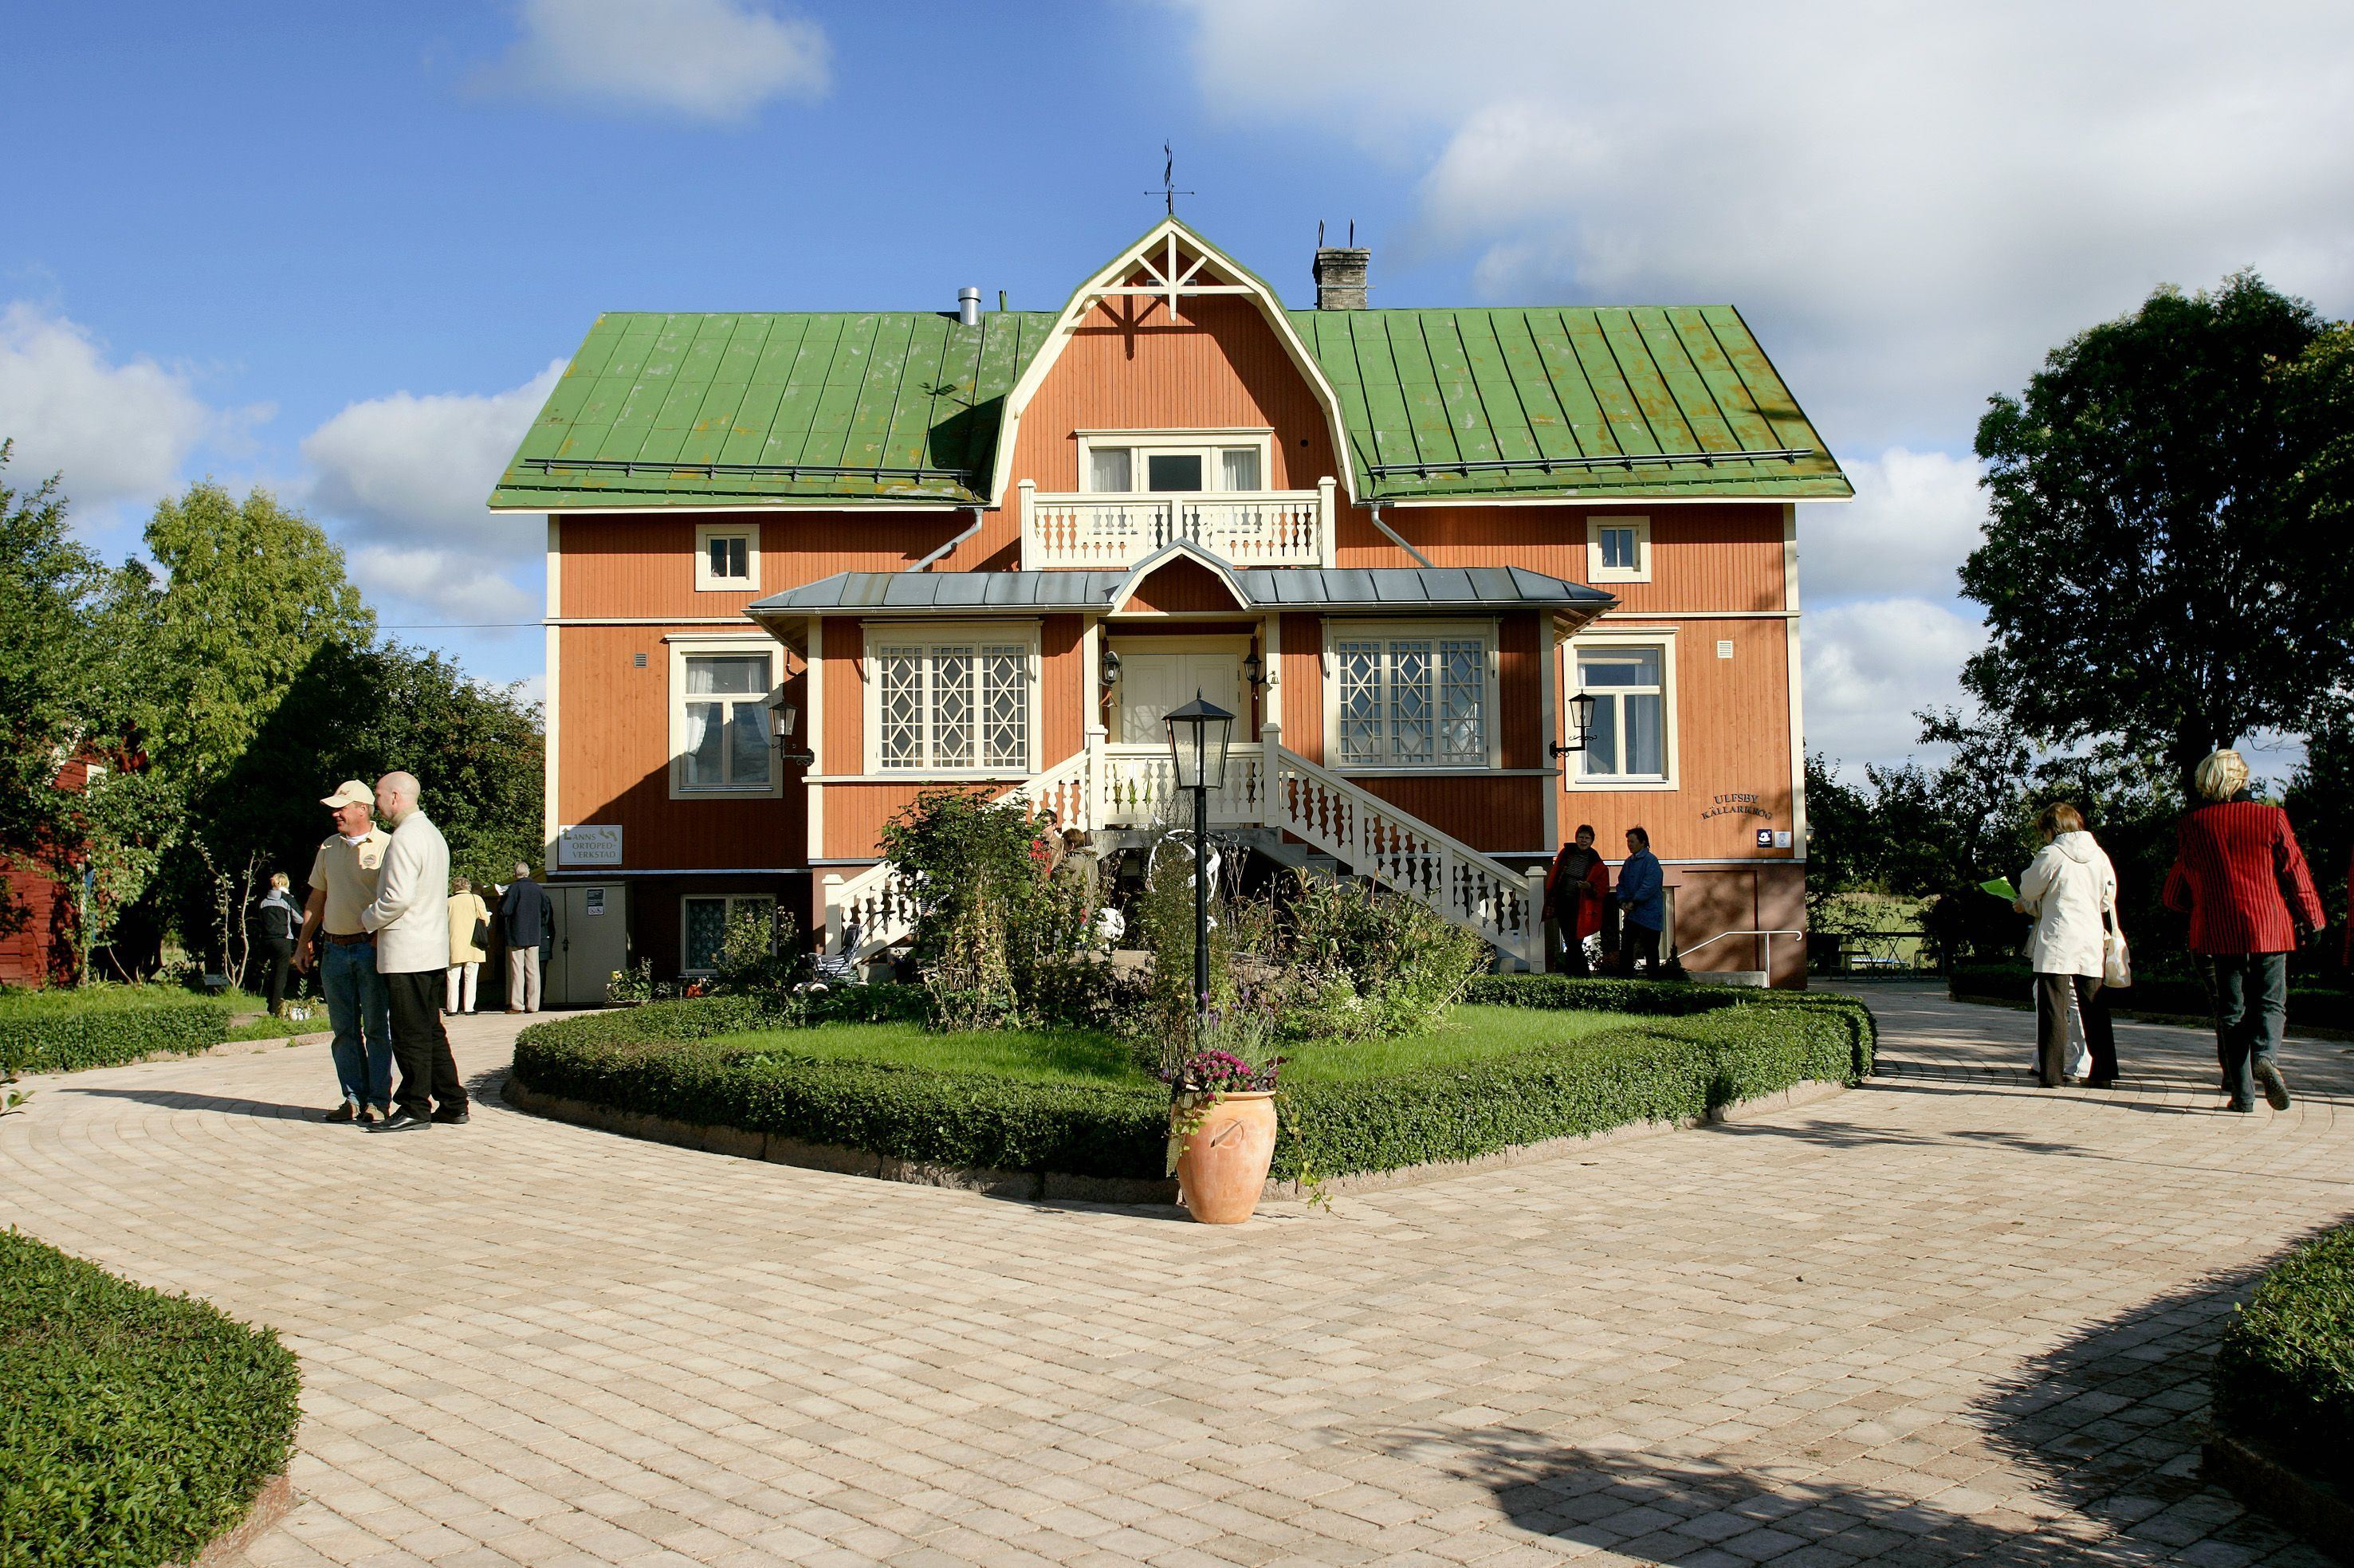 Ulfsby gård